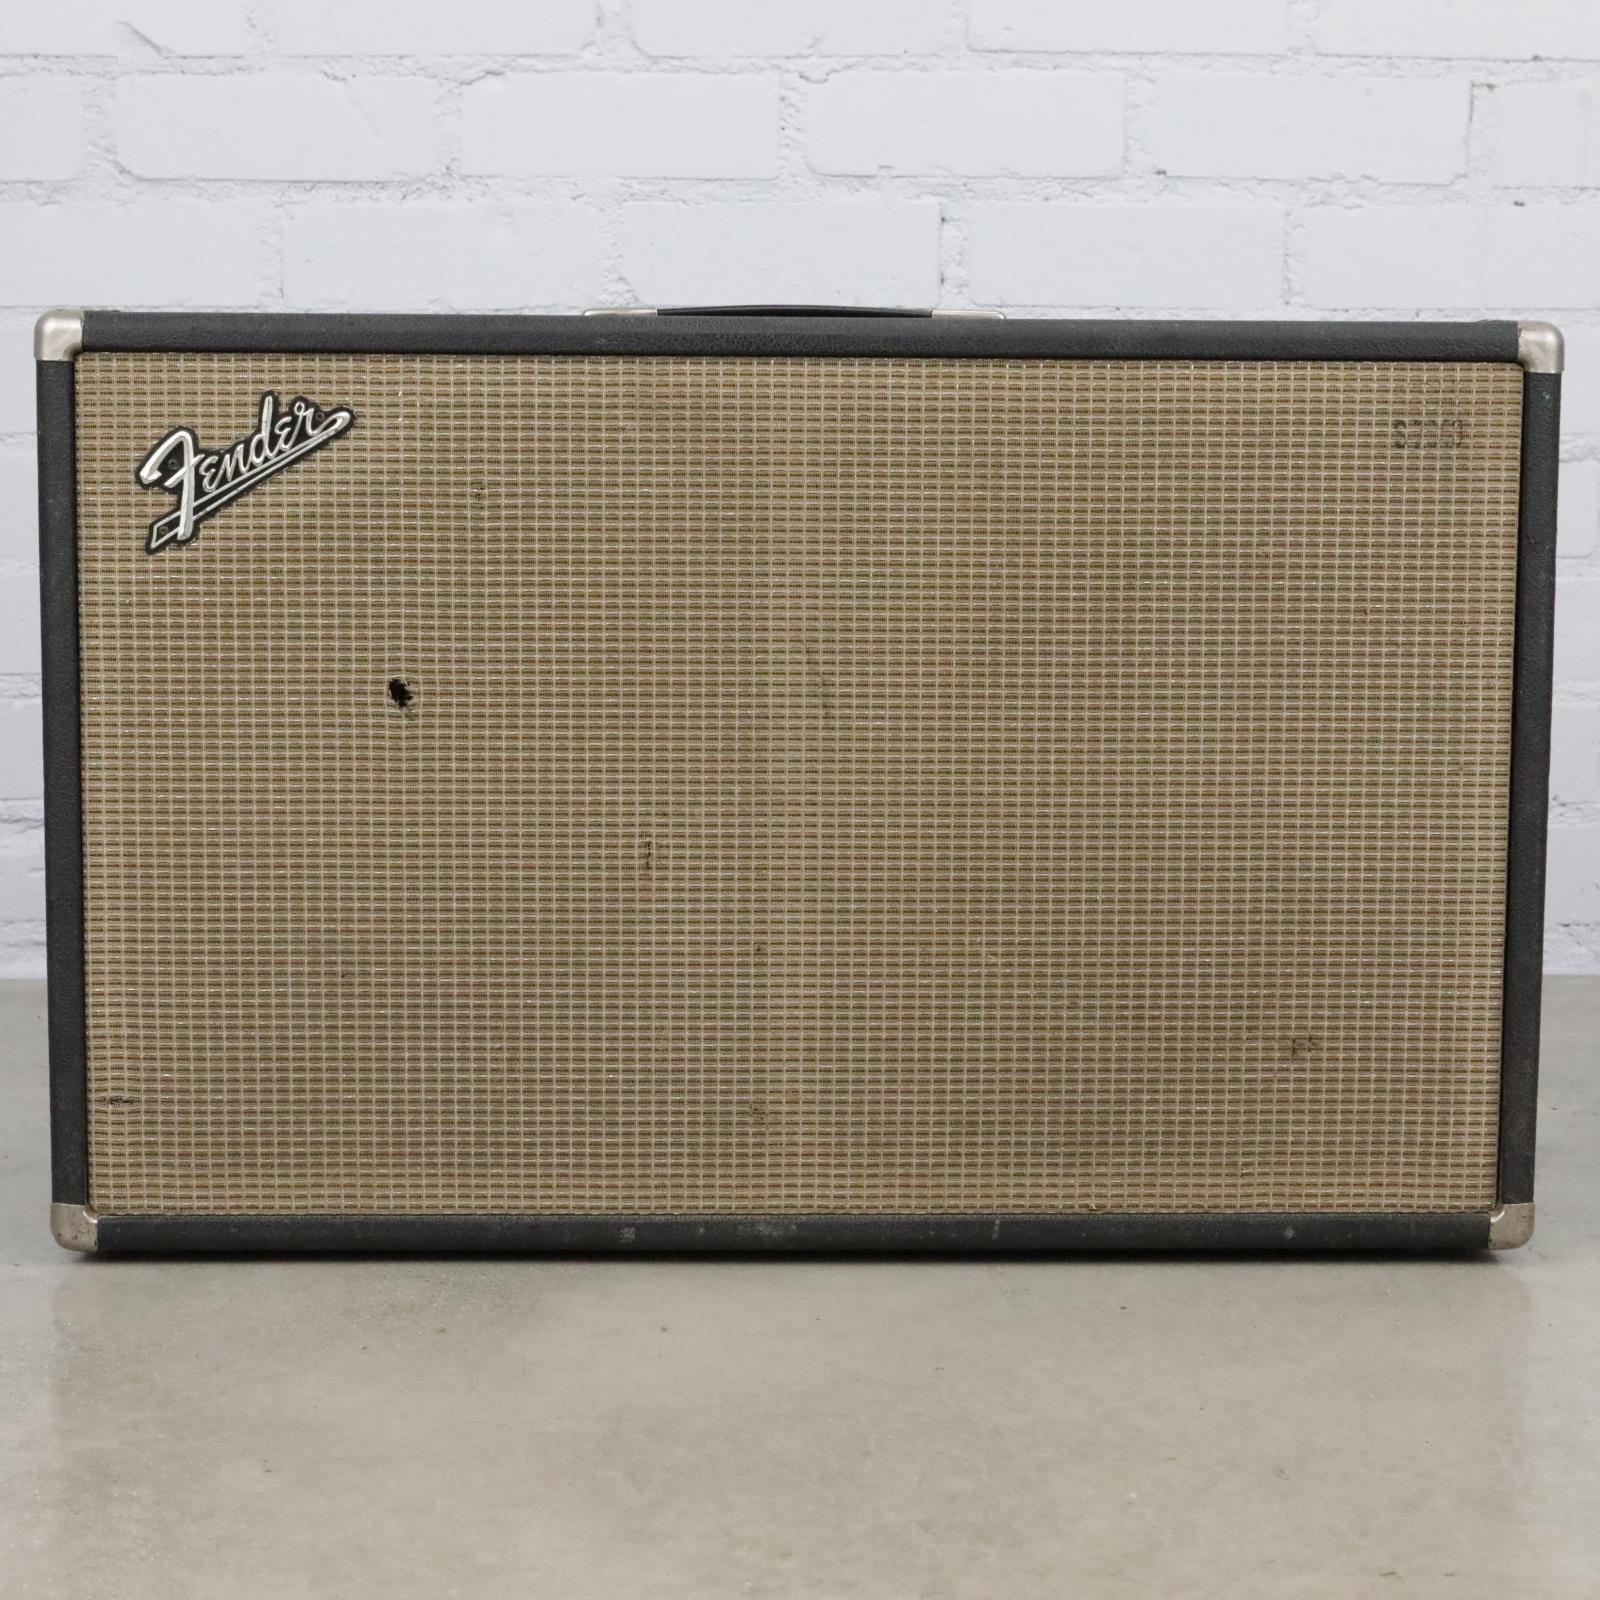 1960's Fender Bandmaster 2x12 Cabinet w/Celestion G12 Vintage 30 Speakers #40473